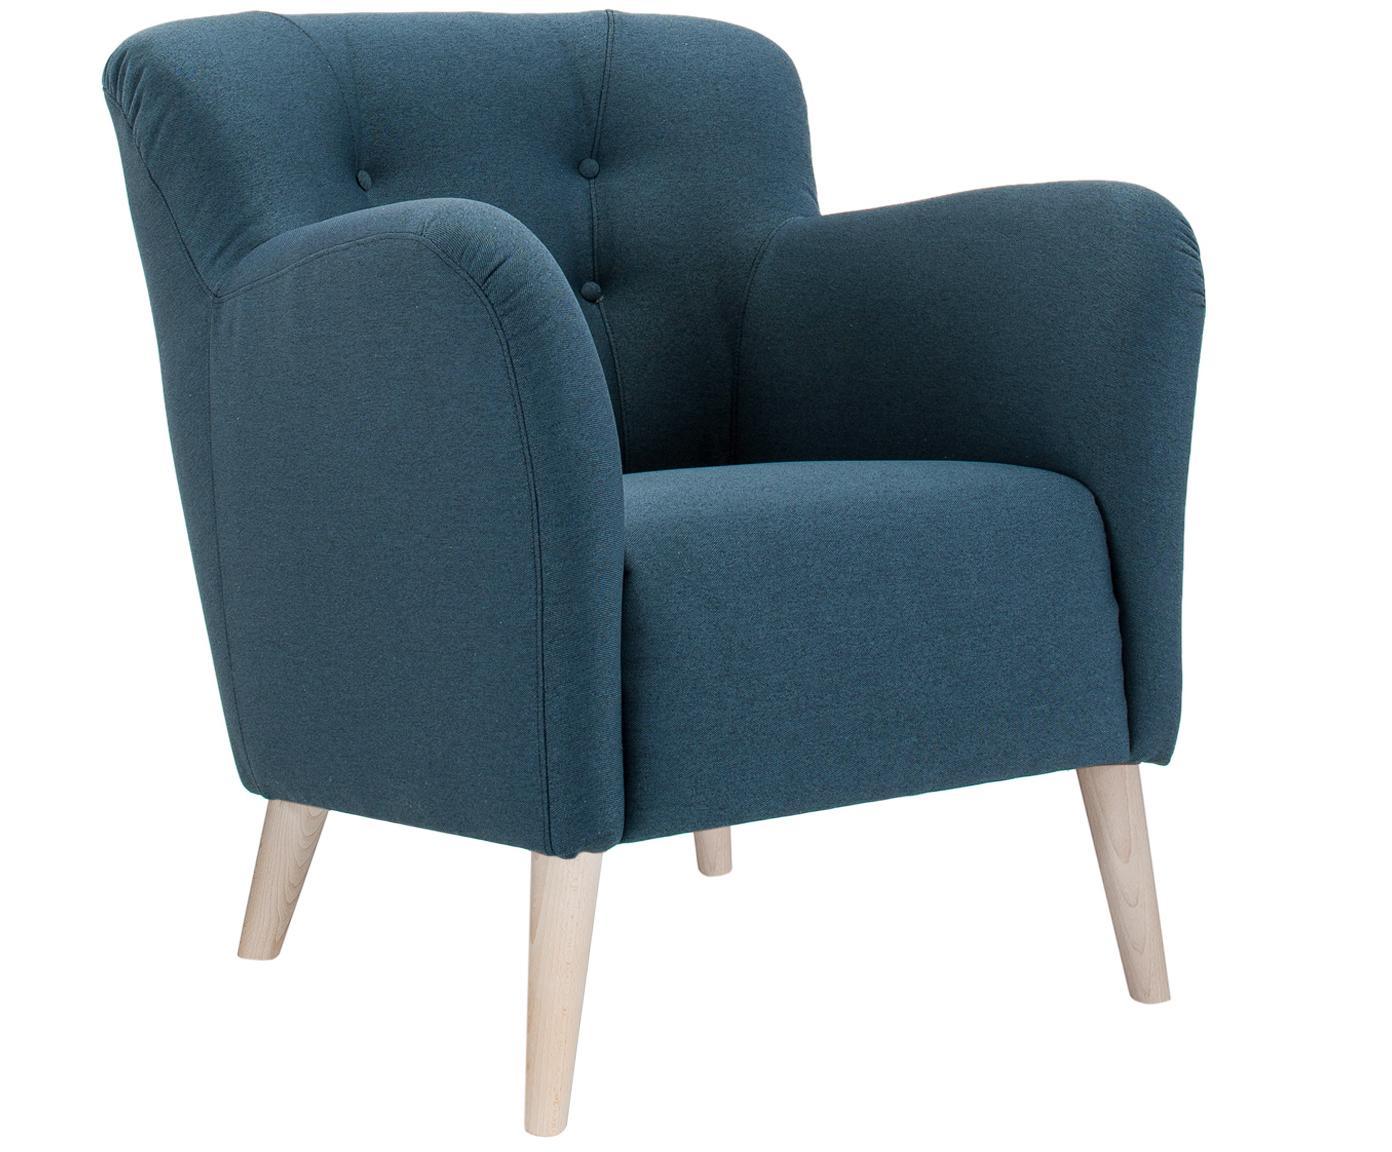 Fauteuil Vitro, Frame: Hout, Poten: Beukenhout, Hoes: Blauw. Poten: Beukenhout, wit gewassen, 75 x 84 cm